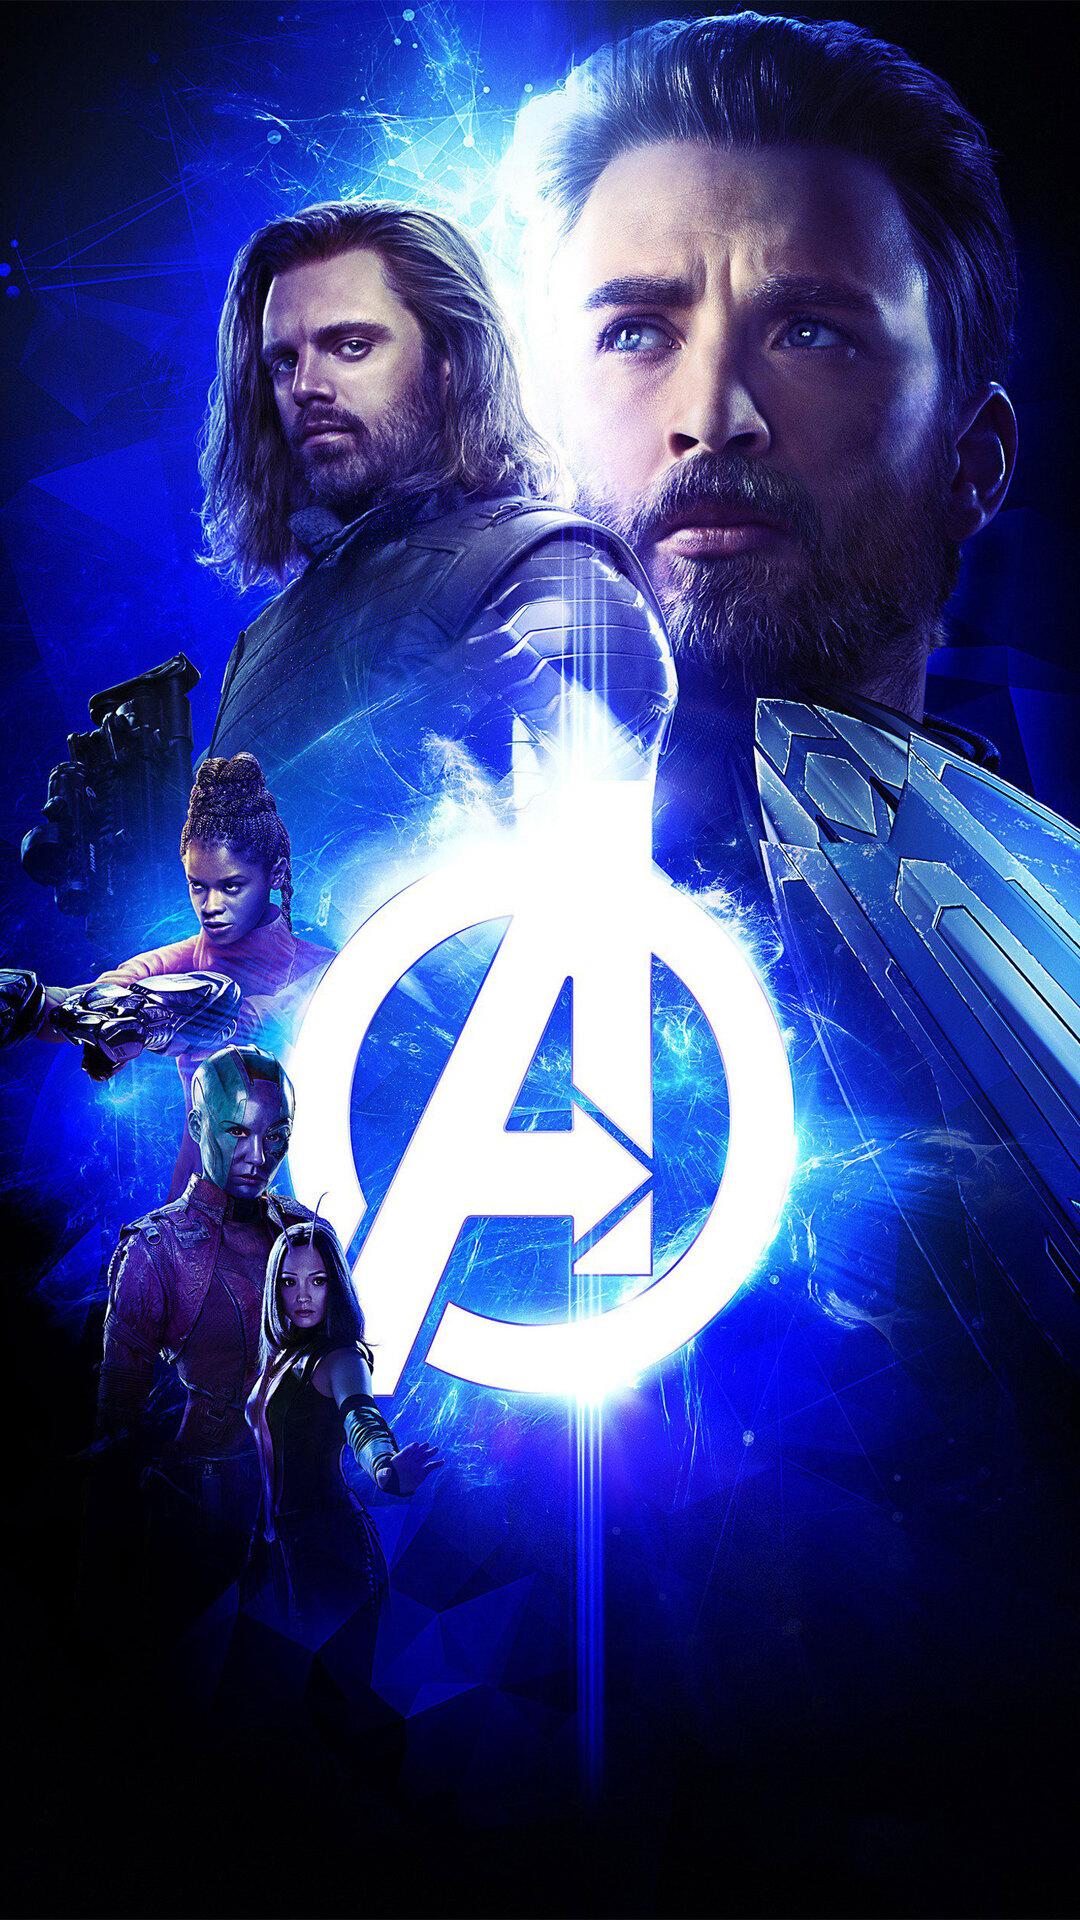 avengers-infinity-war-2018-space-stone-poster-4k-au.jpg